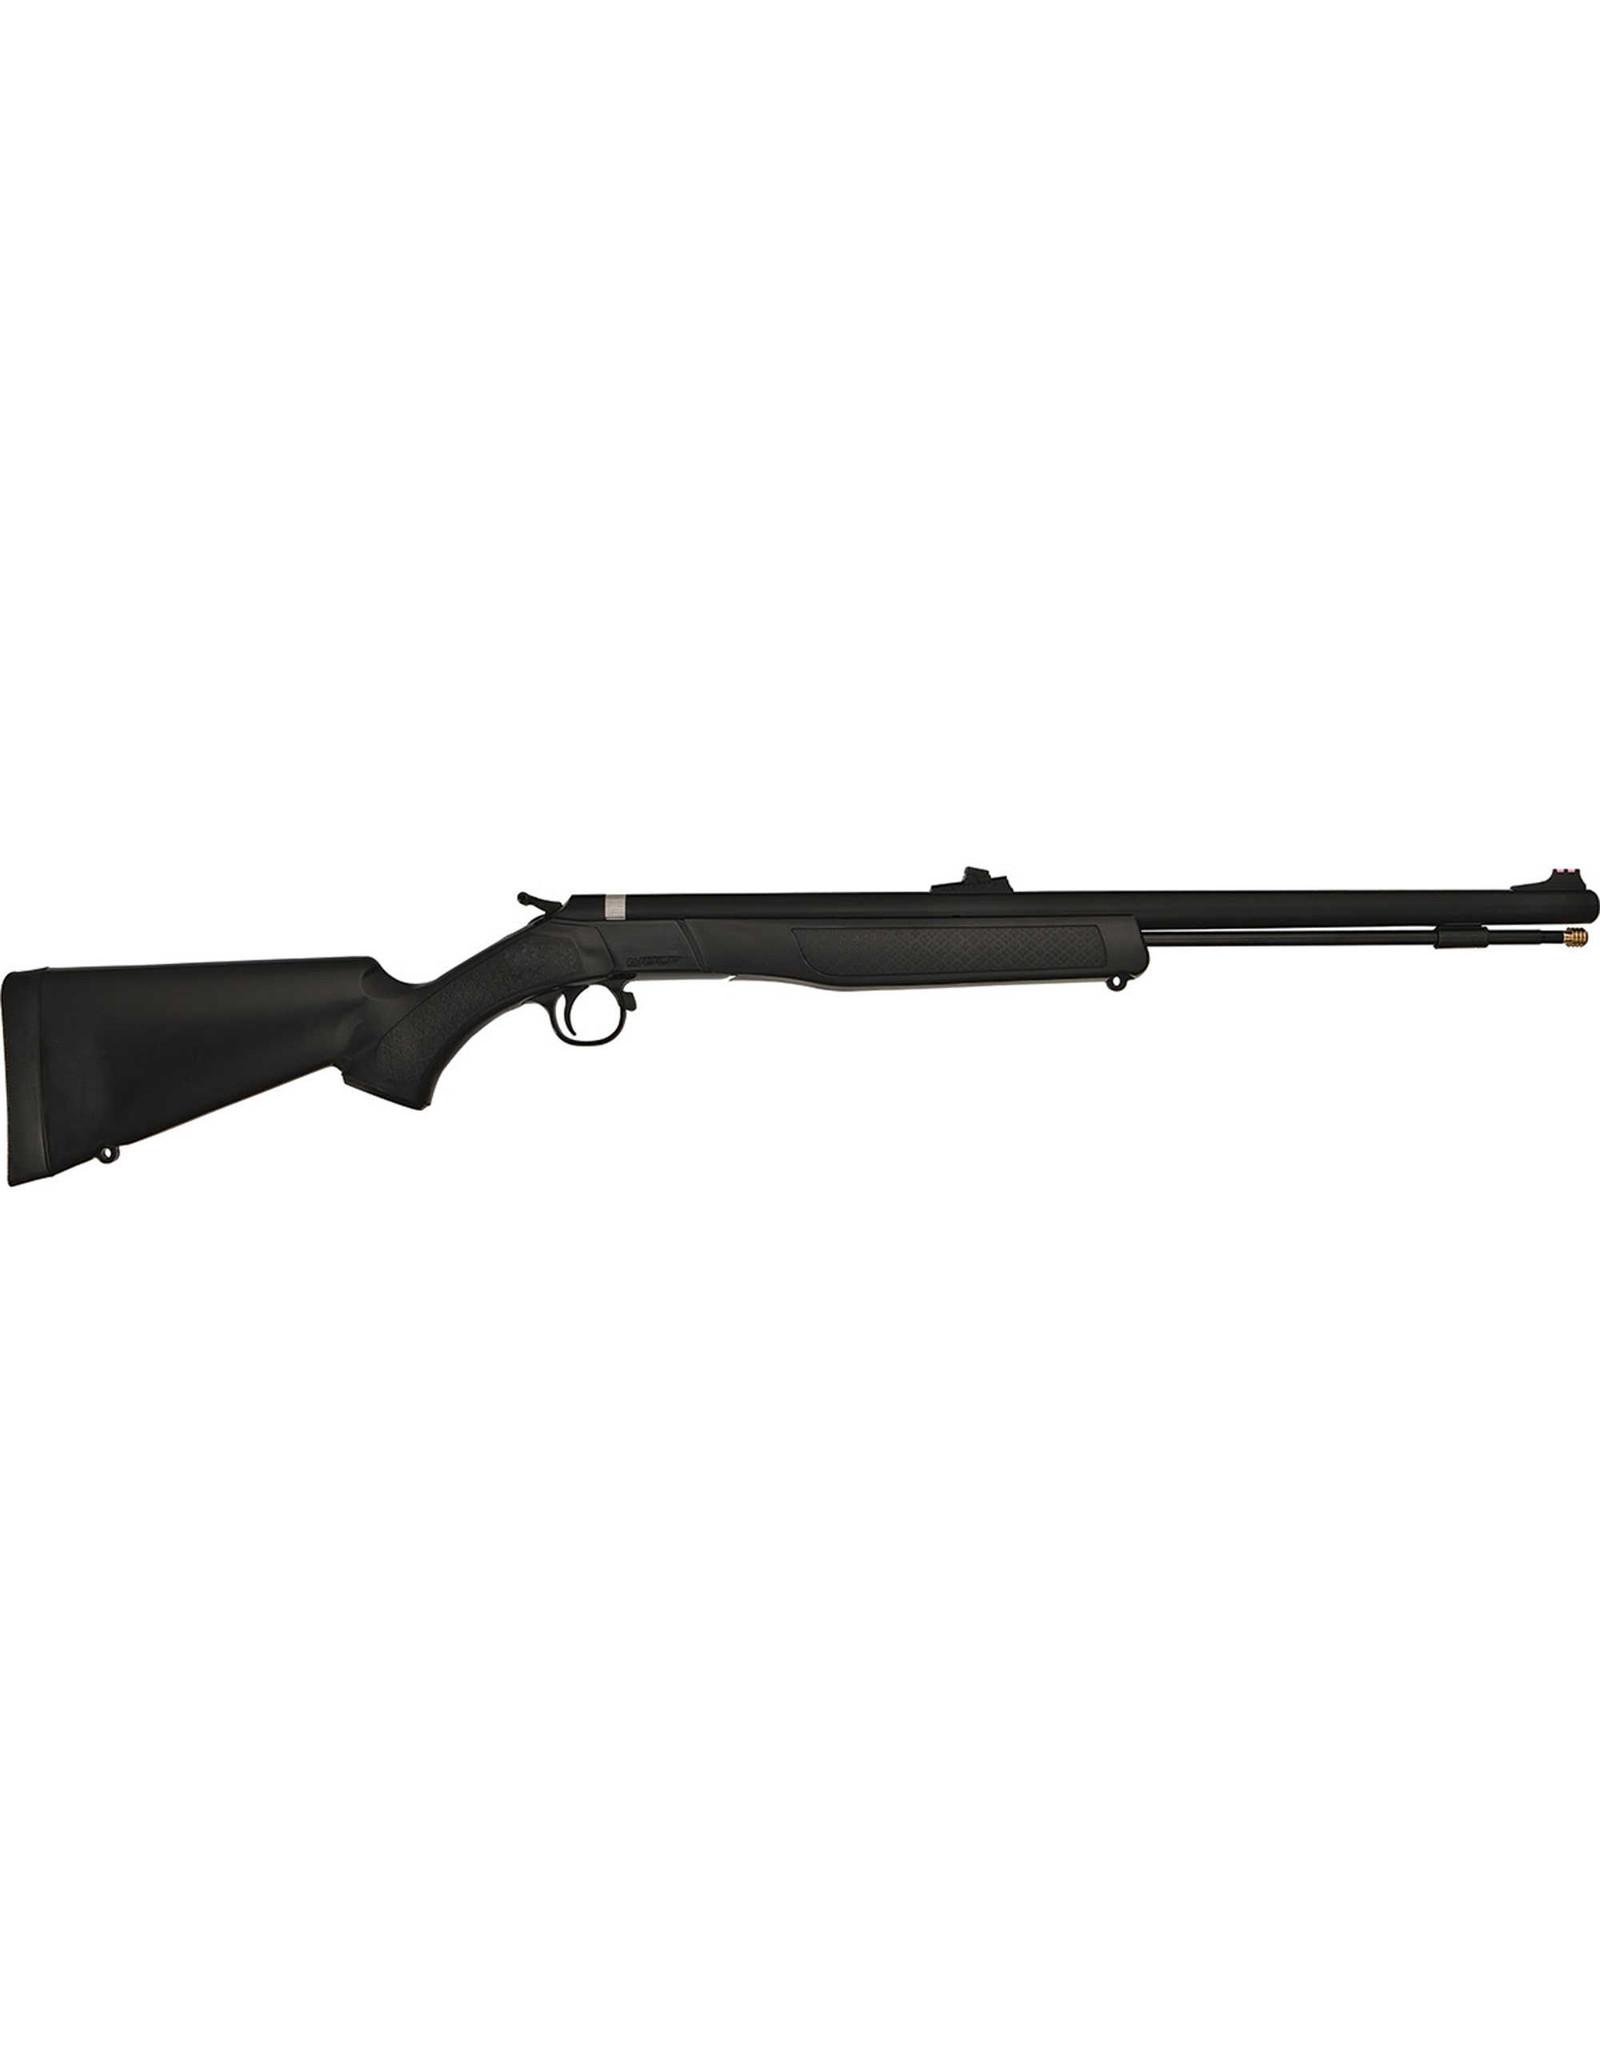 "CVA CVA Wolf .50cal Muzzleloading Rifle Black Syn 24"" BBL PR2110"